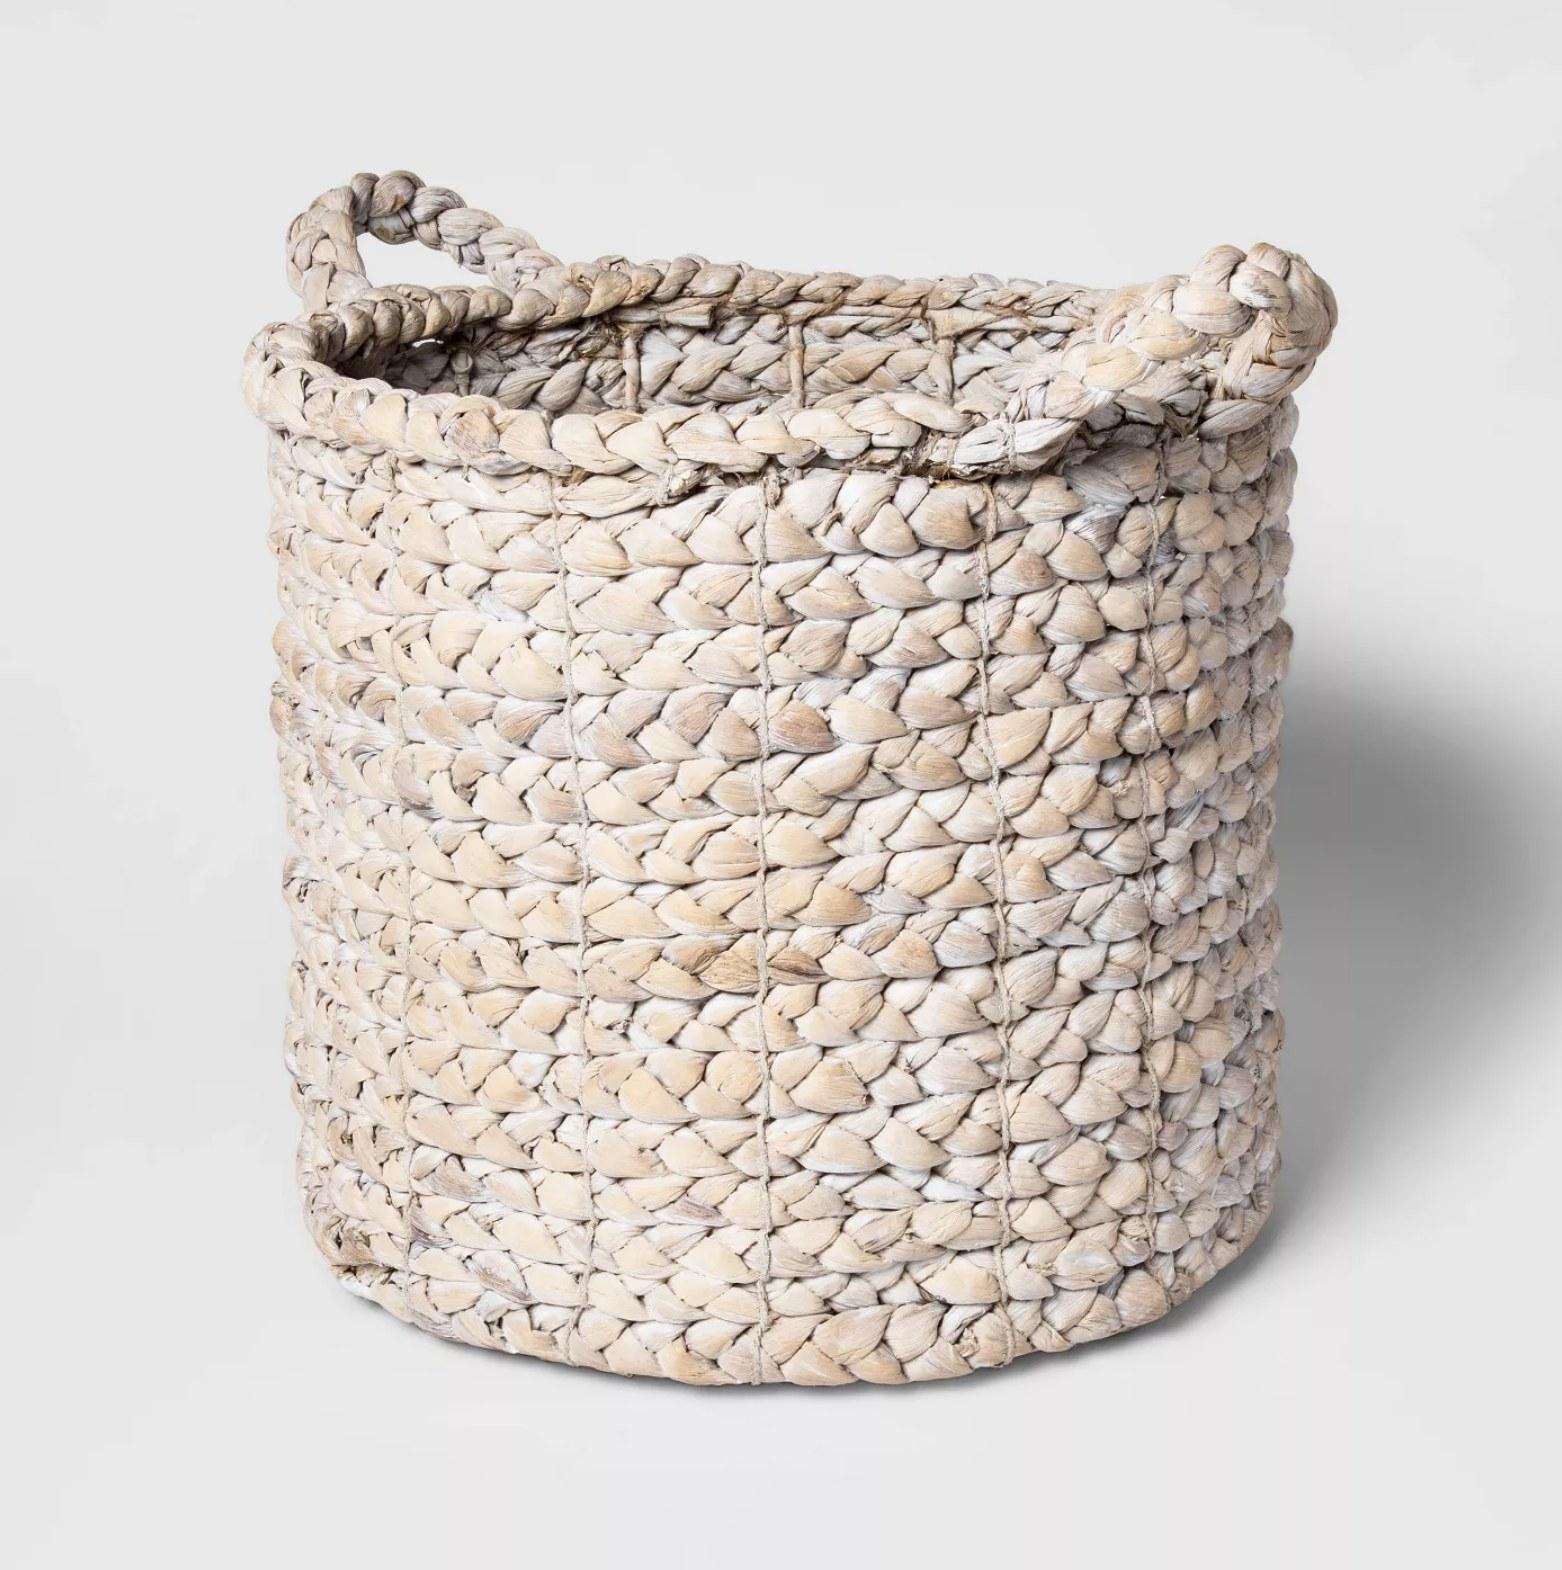 A braided decorative straw basket